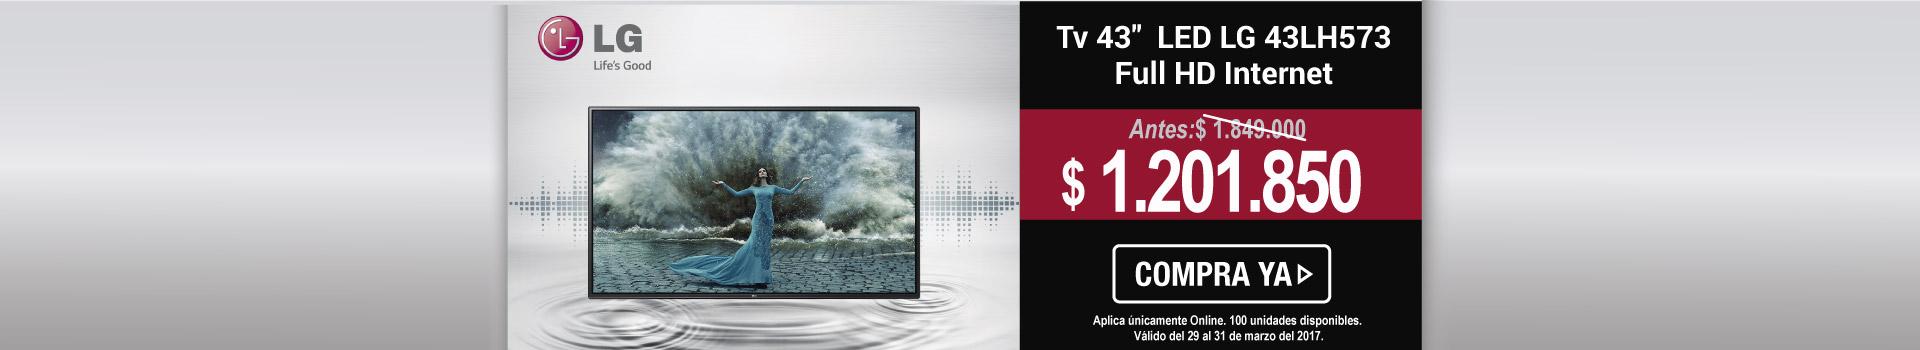 Tv 43 108 cm LED LG 43LH573 Full HD Internet - banner principal